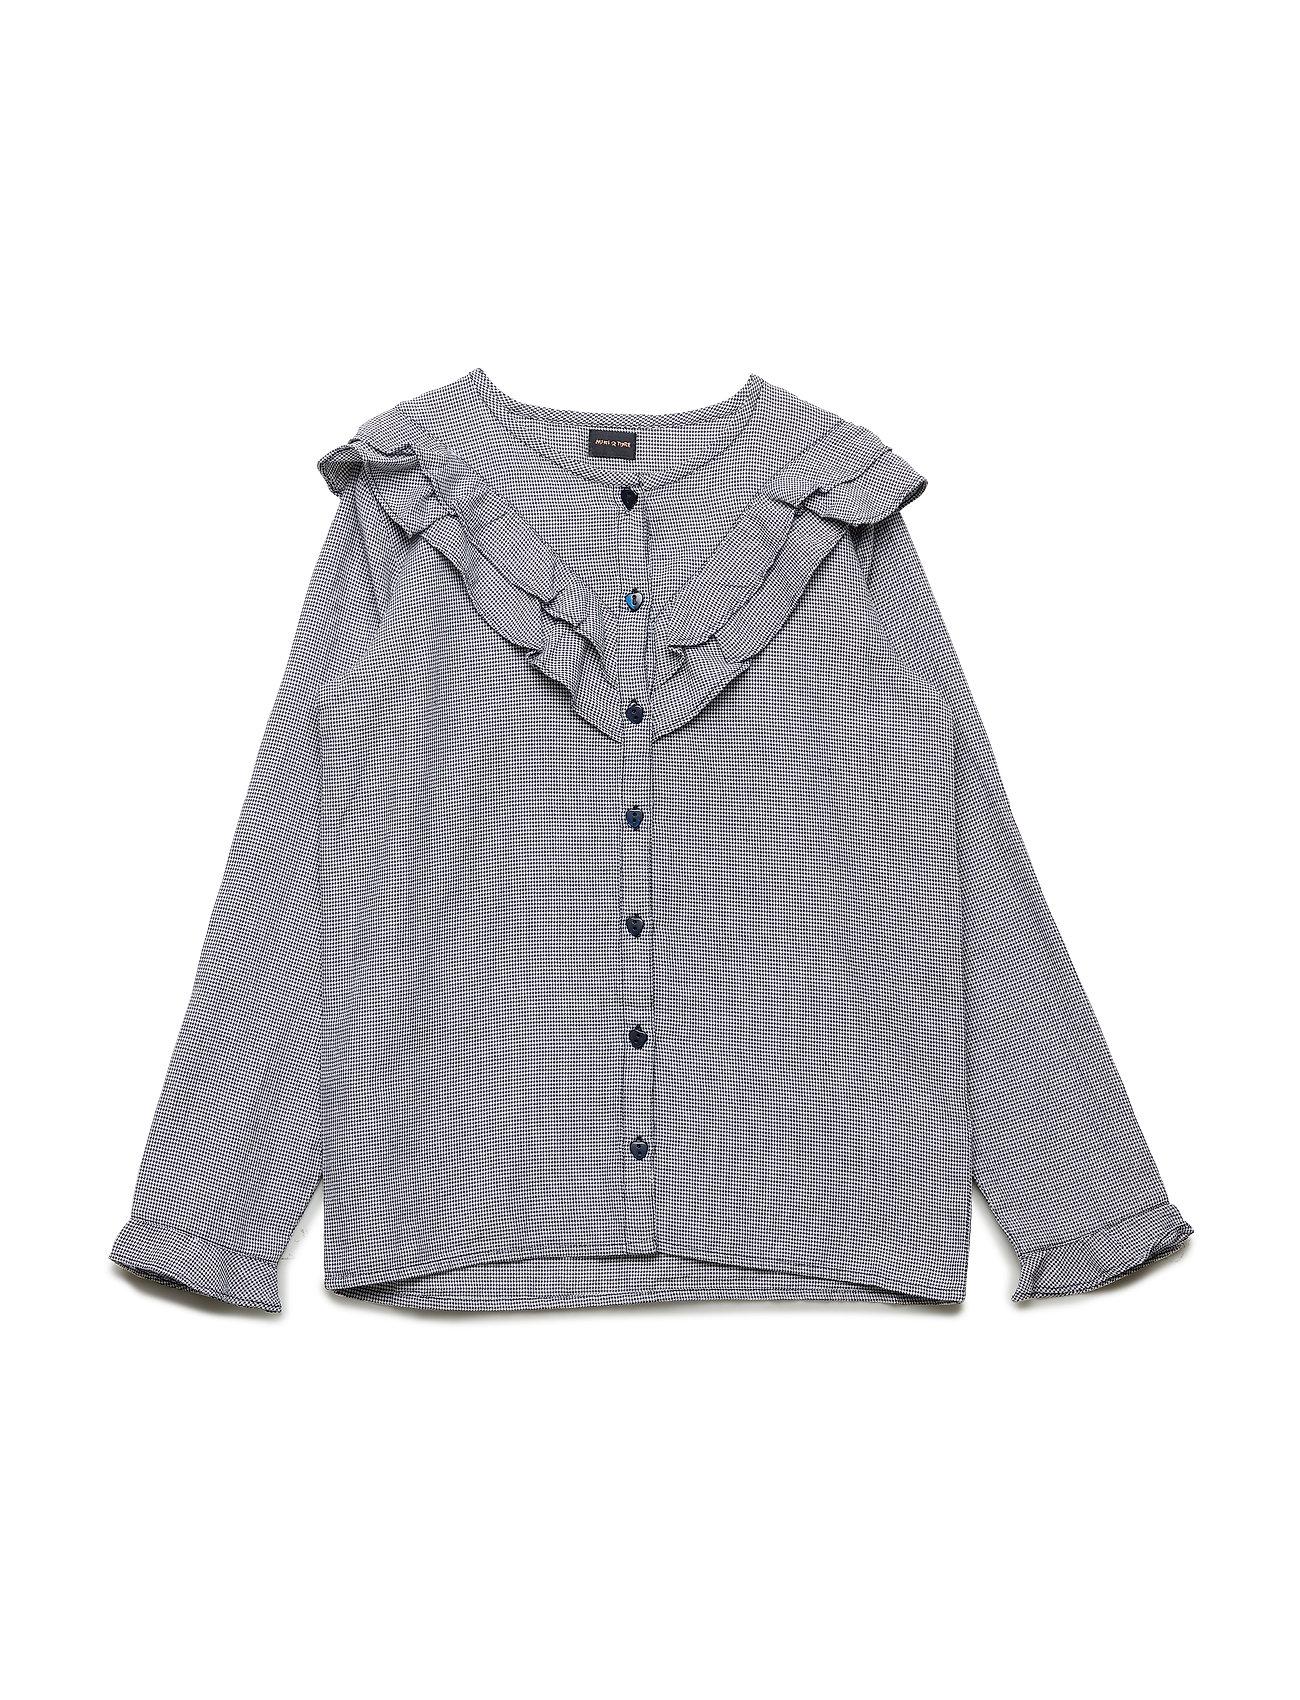 Mini A Ture Maia Shirt, K - SKY CAPTAIN BLUE